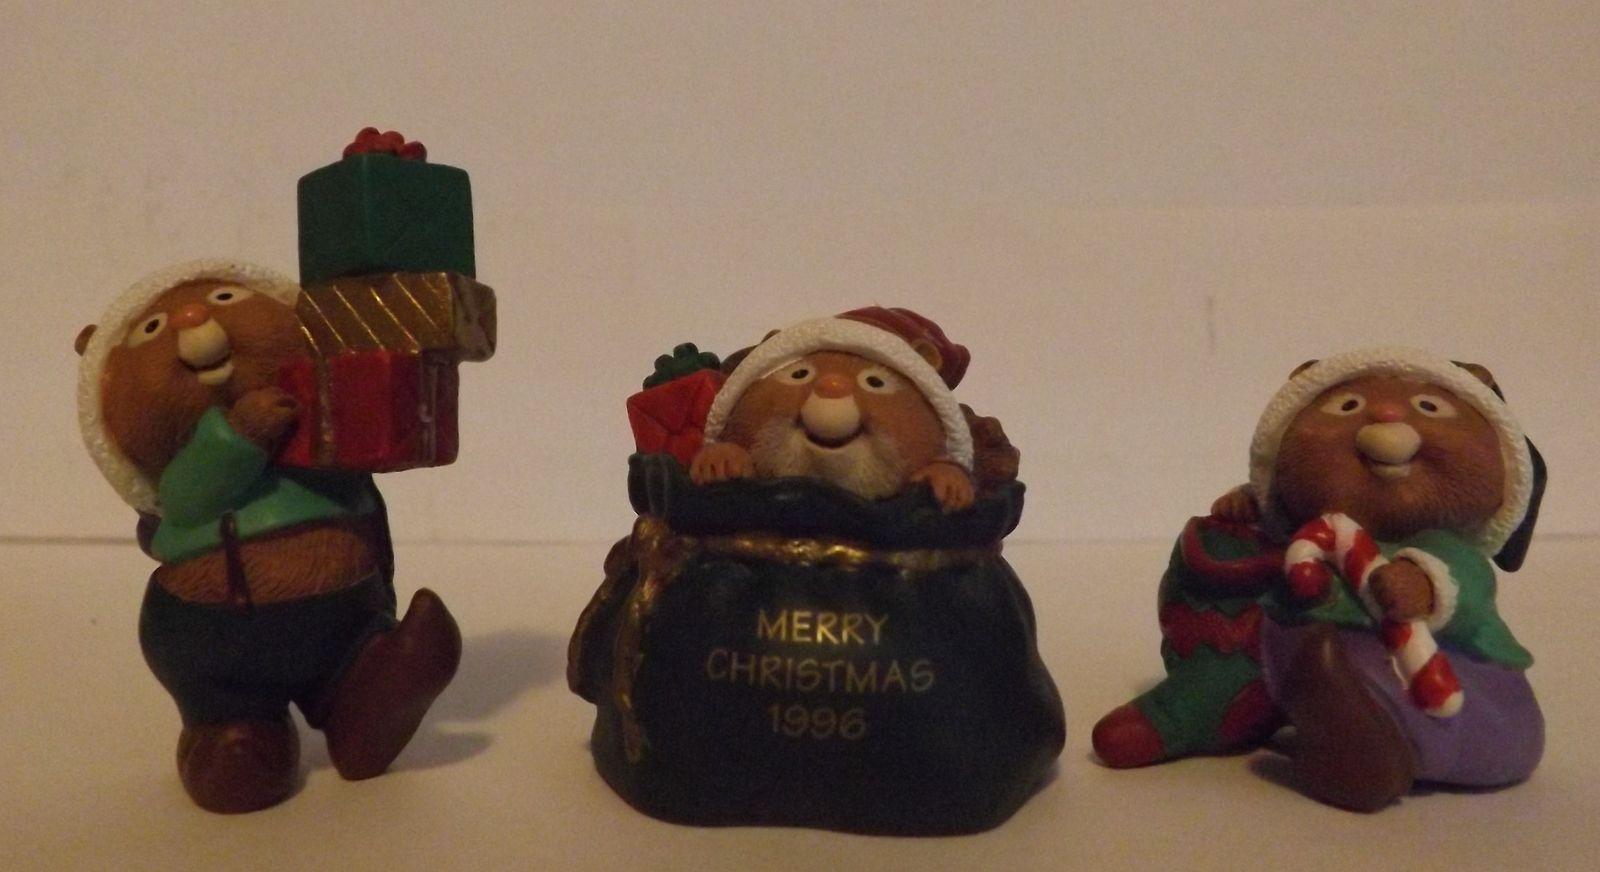 Hallmark Merry Miniatures Santa's Helpers 3-Piece Set Holidays 1996